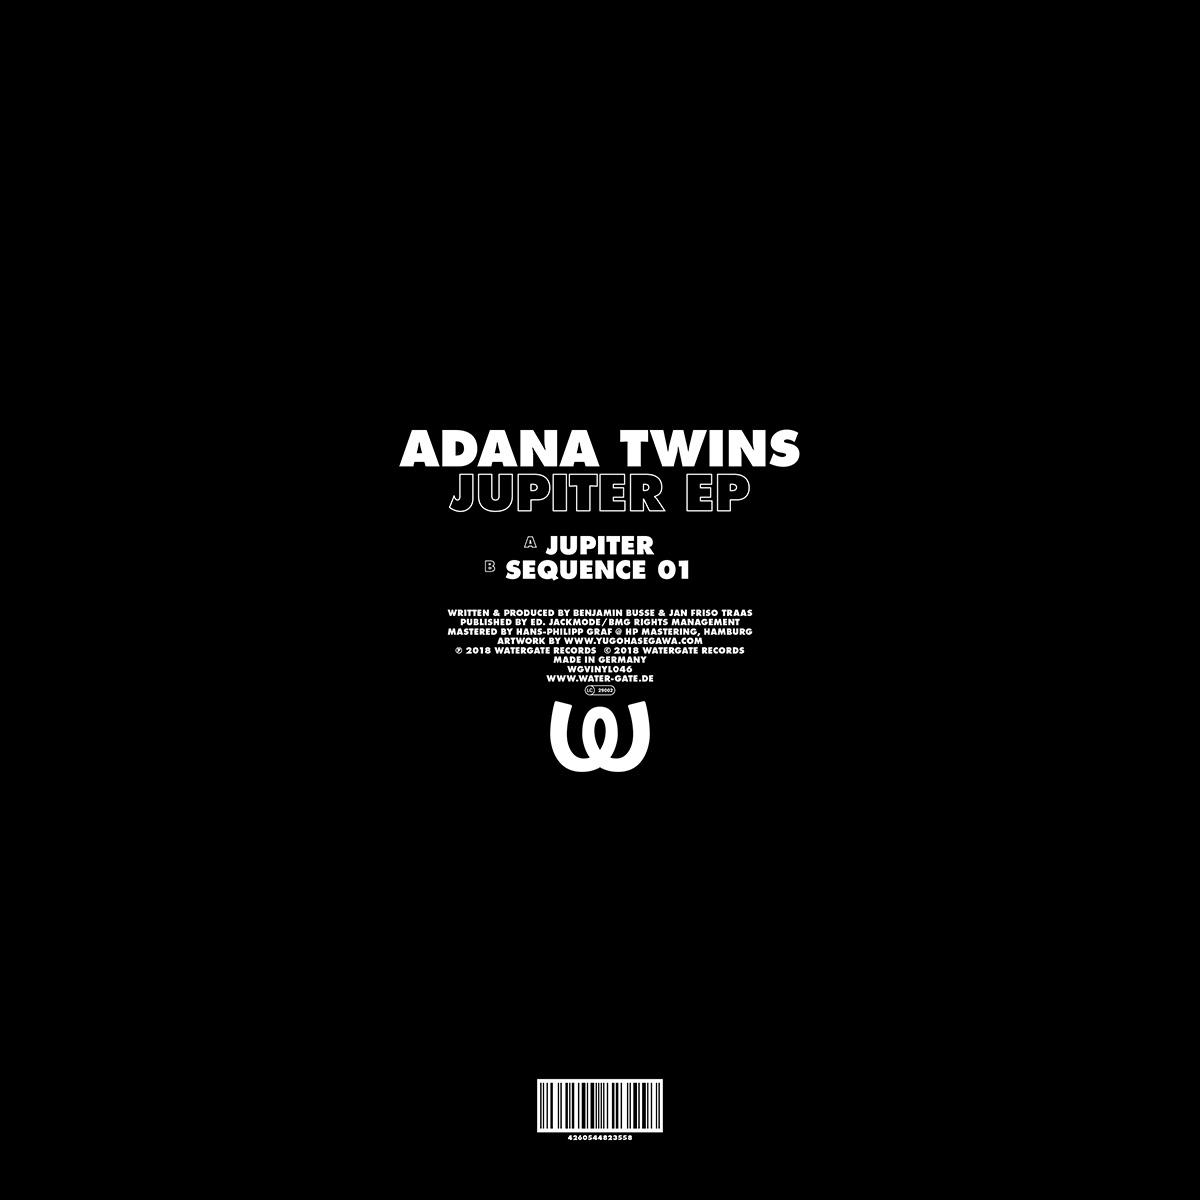 Adana Twins Jupiter EP